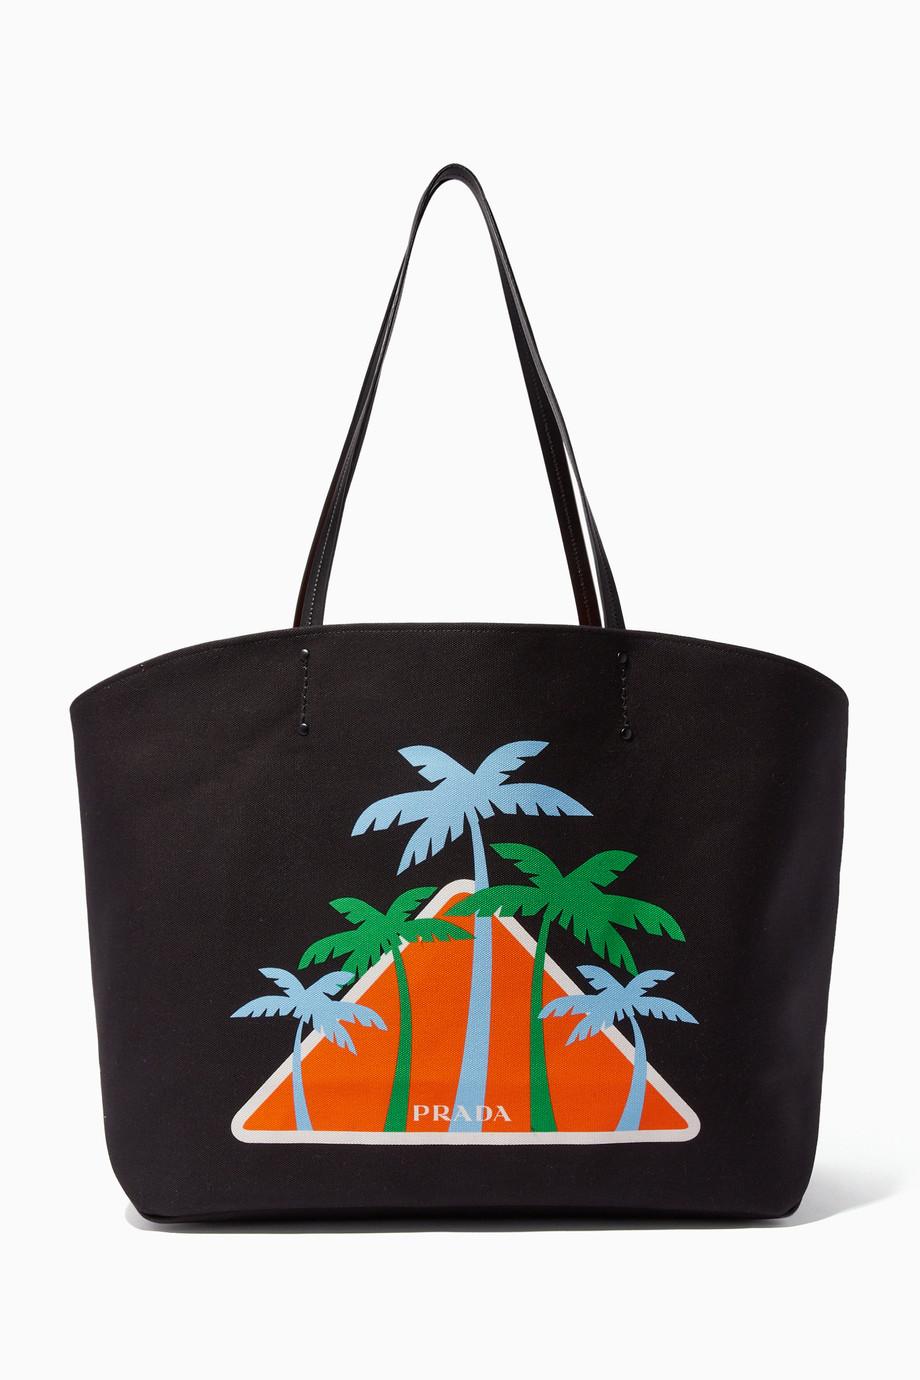 d095cba7a2 Shop Prada Black Black Large Printed Canvas Tote Bag for Women ...